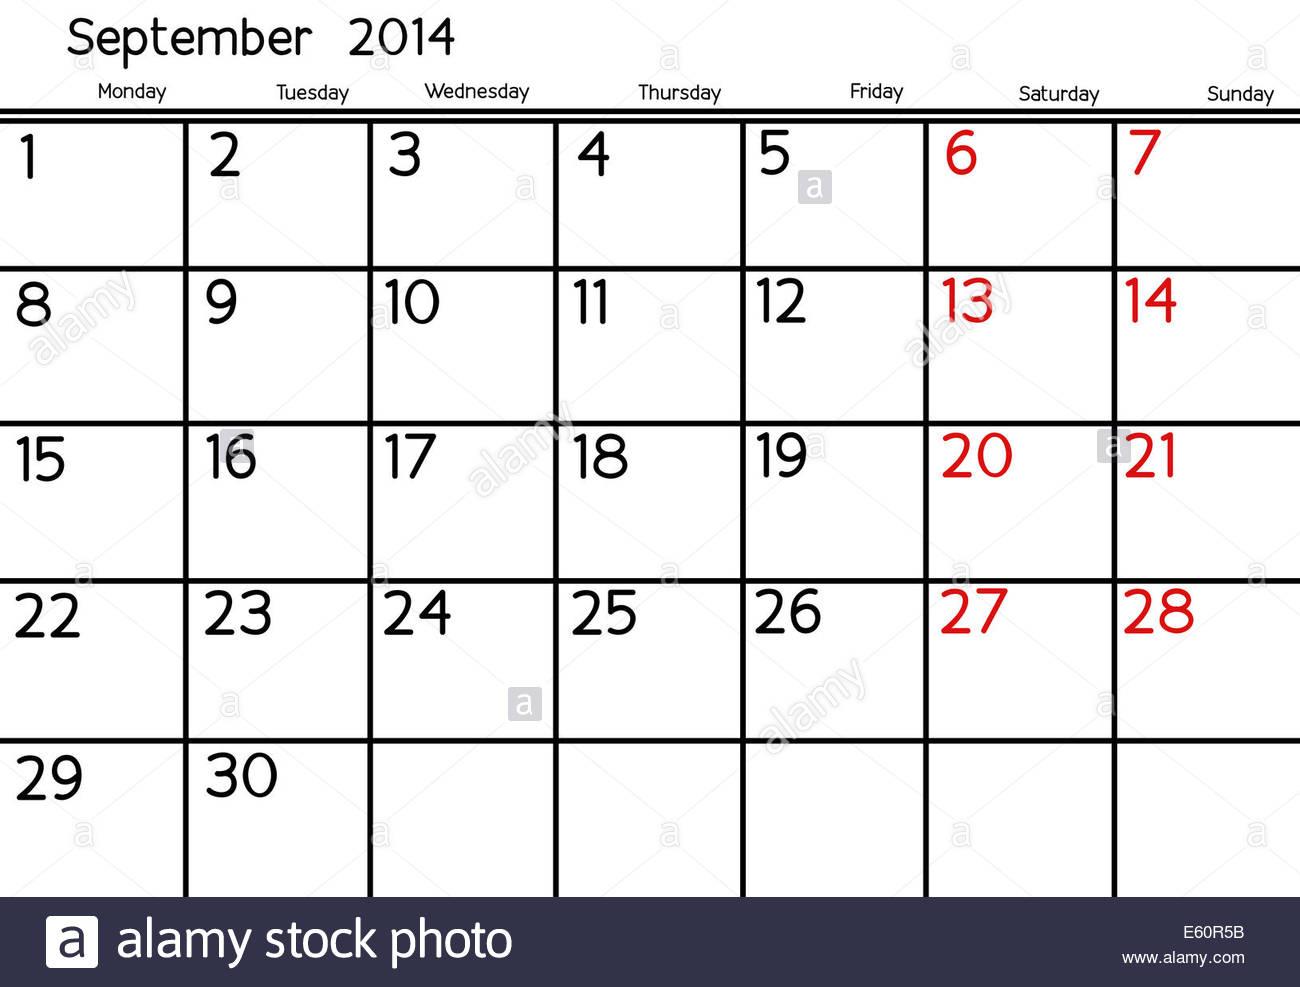 Blank Calendar Of September, 2014 Stock Photo: 72547591  Alamy with regard to Blank Calendar 2014